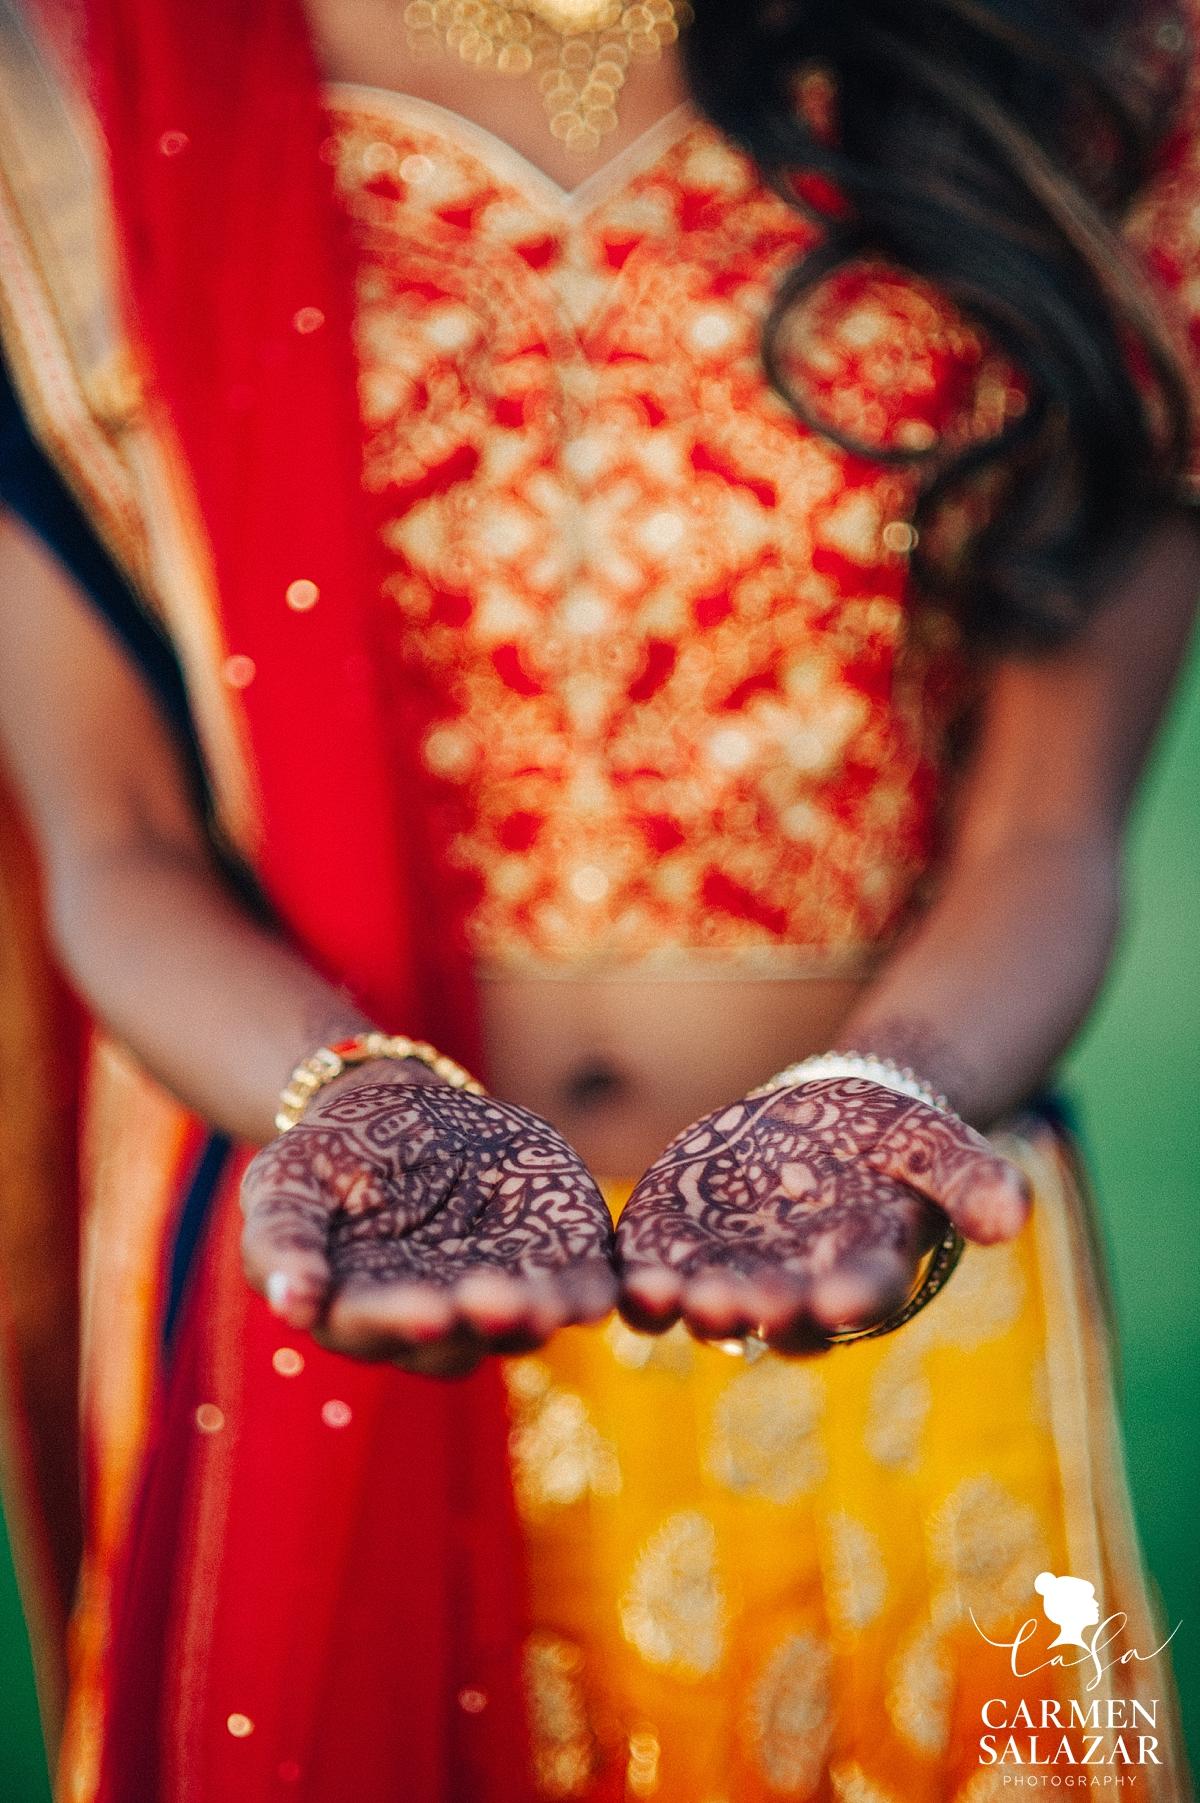 Vibrant sari and ornate henna details - Carmen Salazar